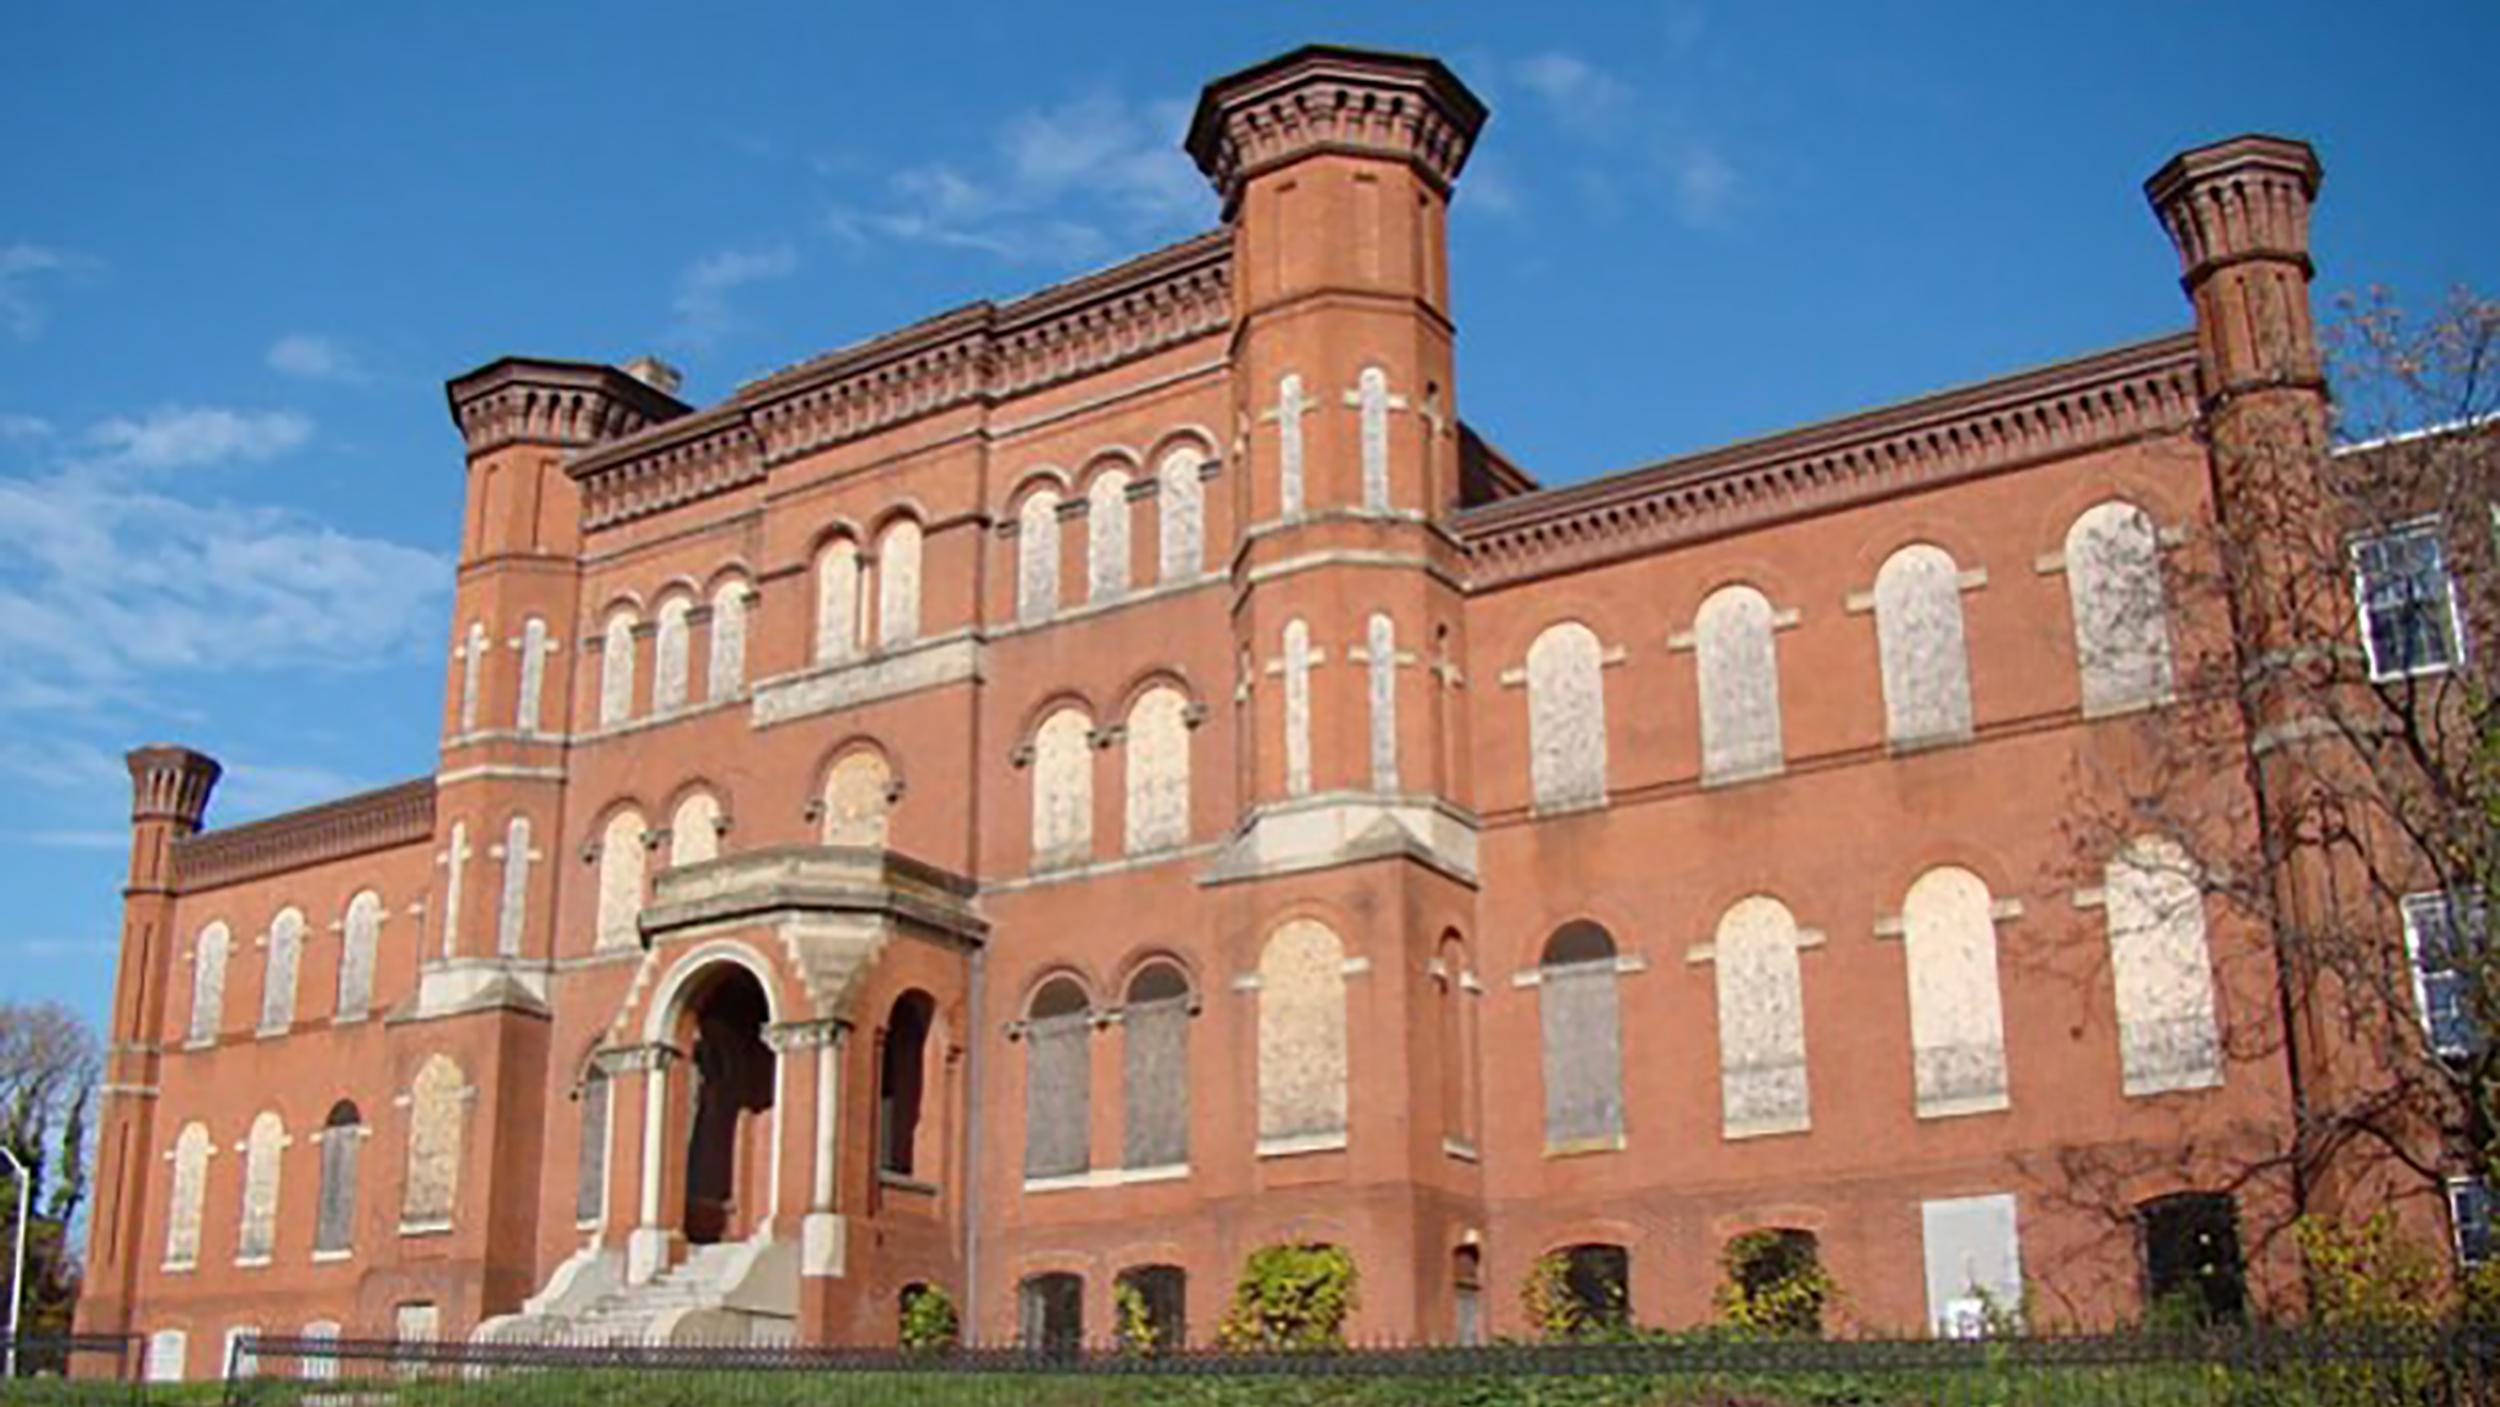 Balto City COVID Testing Center (formerly Hebrew Orphan Asylum)